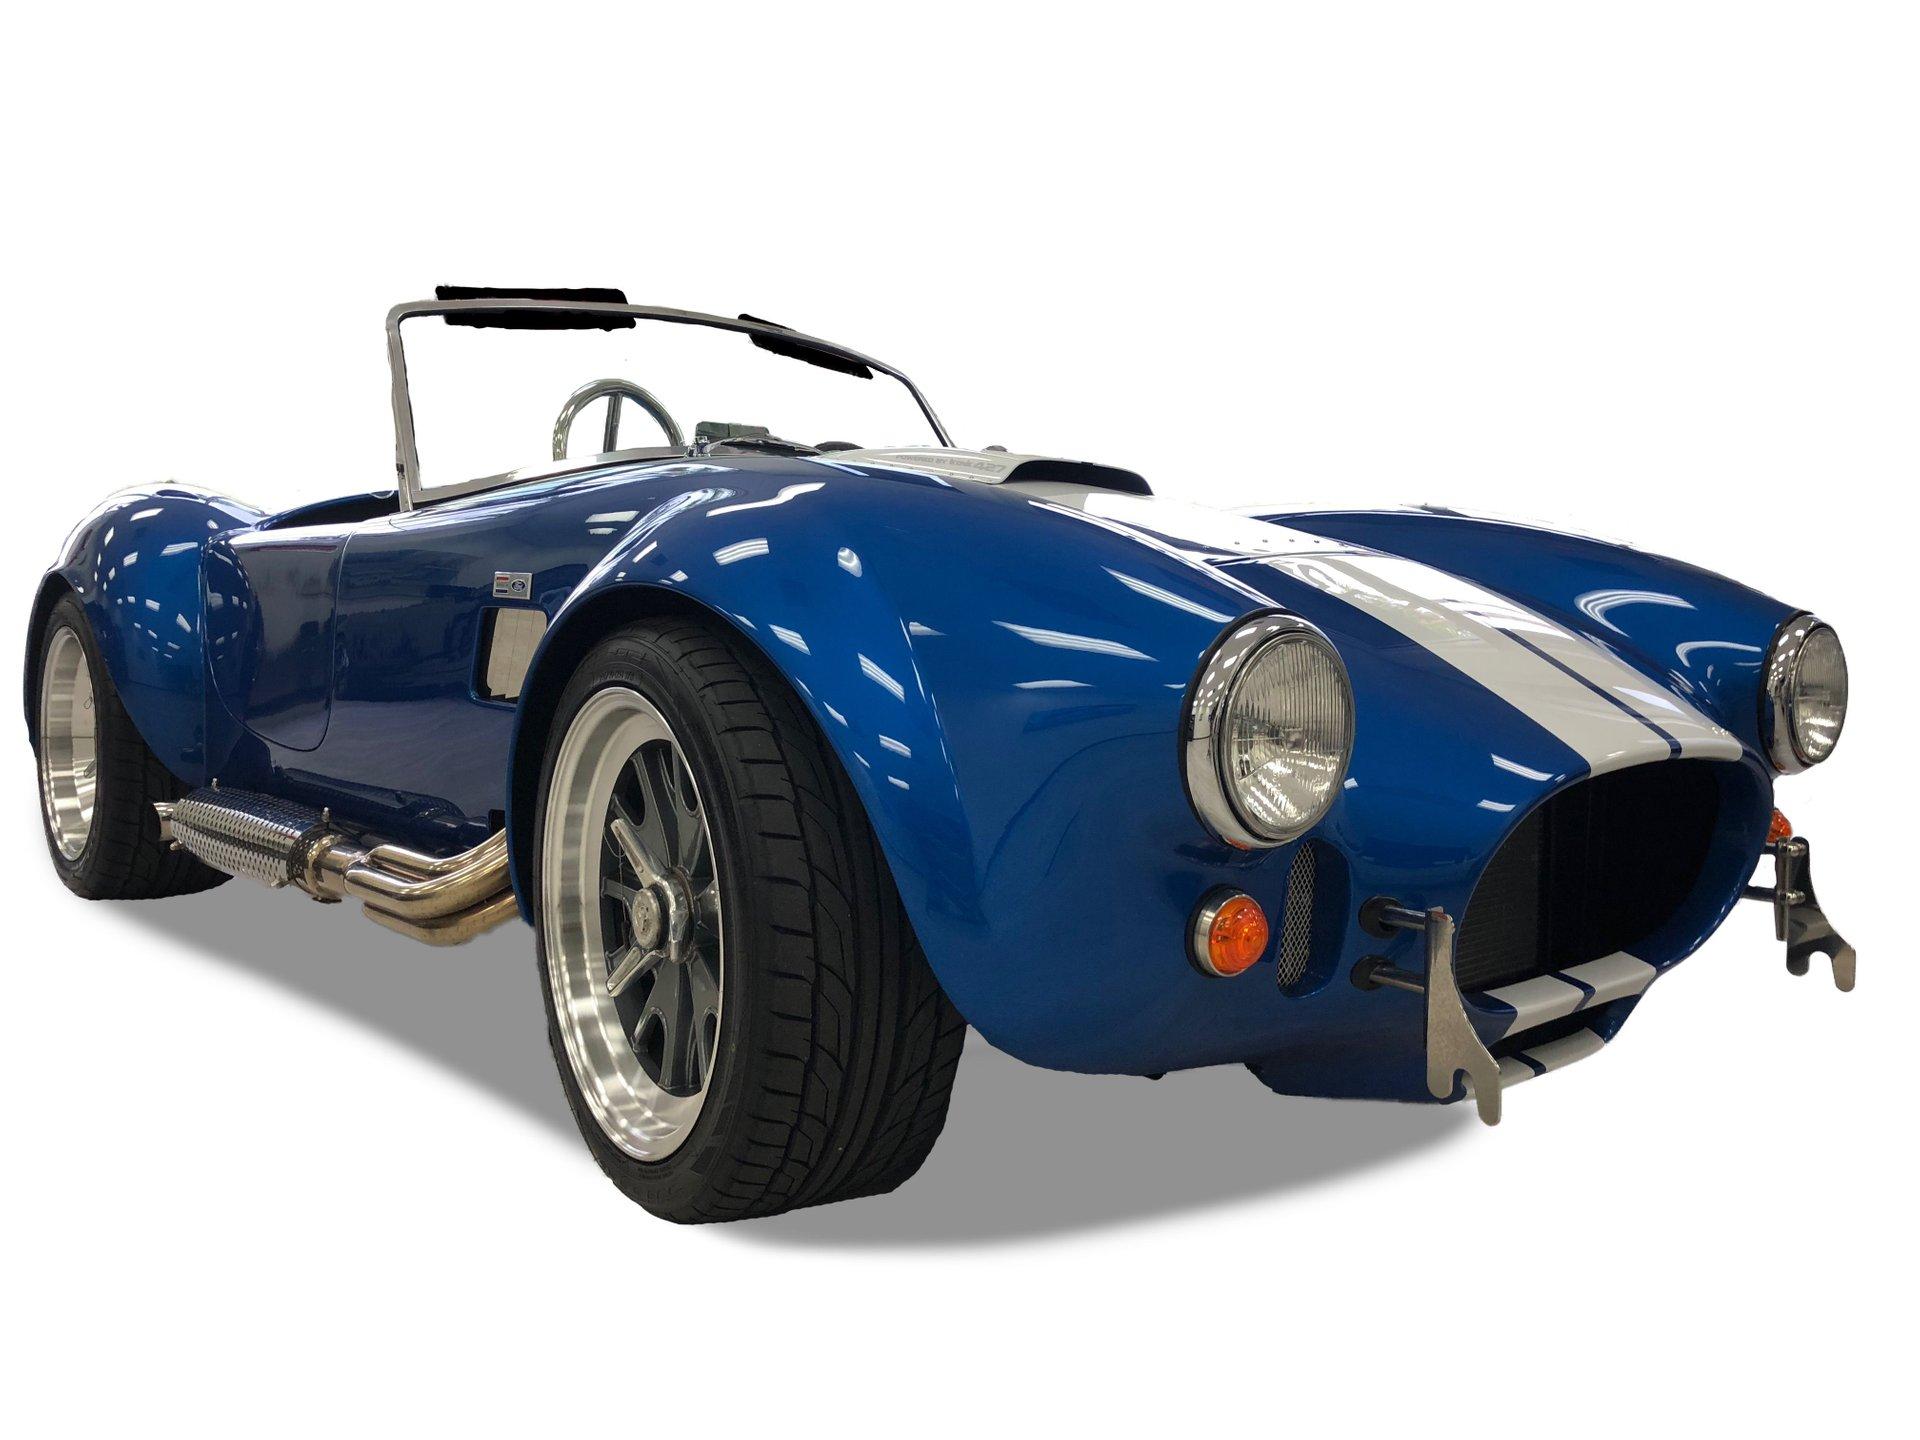 Sudan roadsters clipart svg freeuse download 1965 Cobra Roadster   Auto Cafe of Florida svg freeuse download